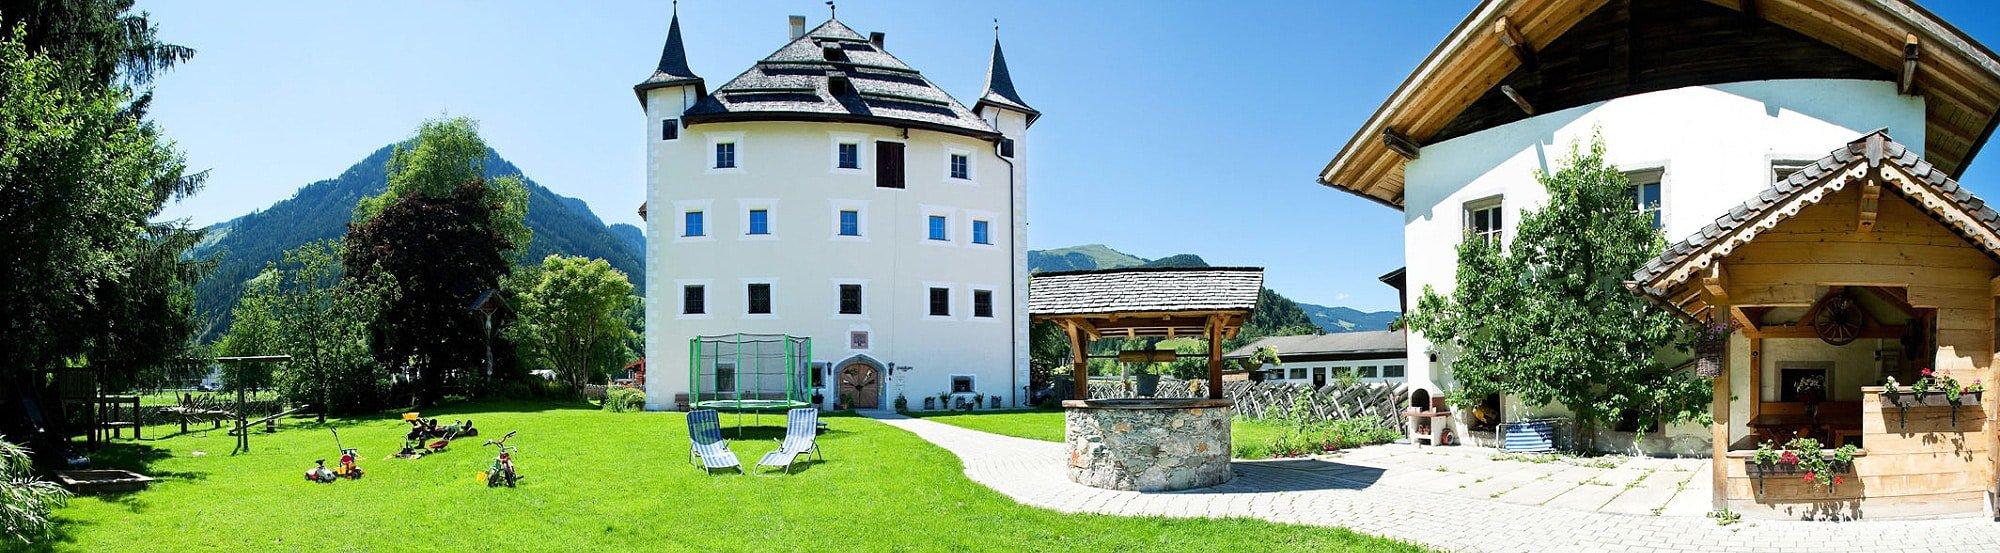 Offers Offers including ski pass Maishofen - bergfex